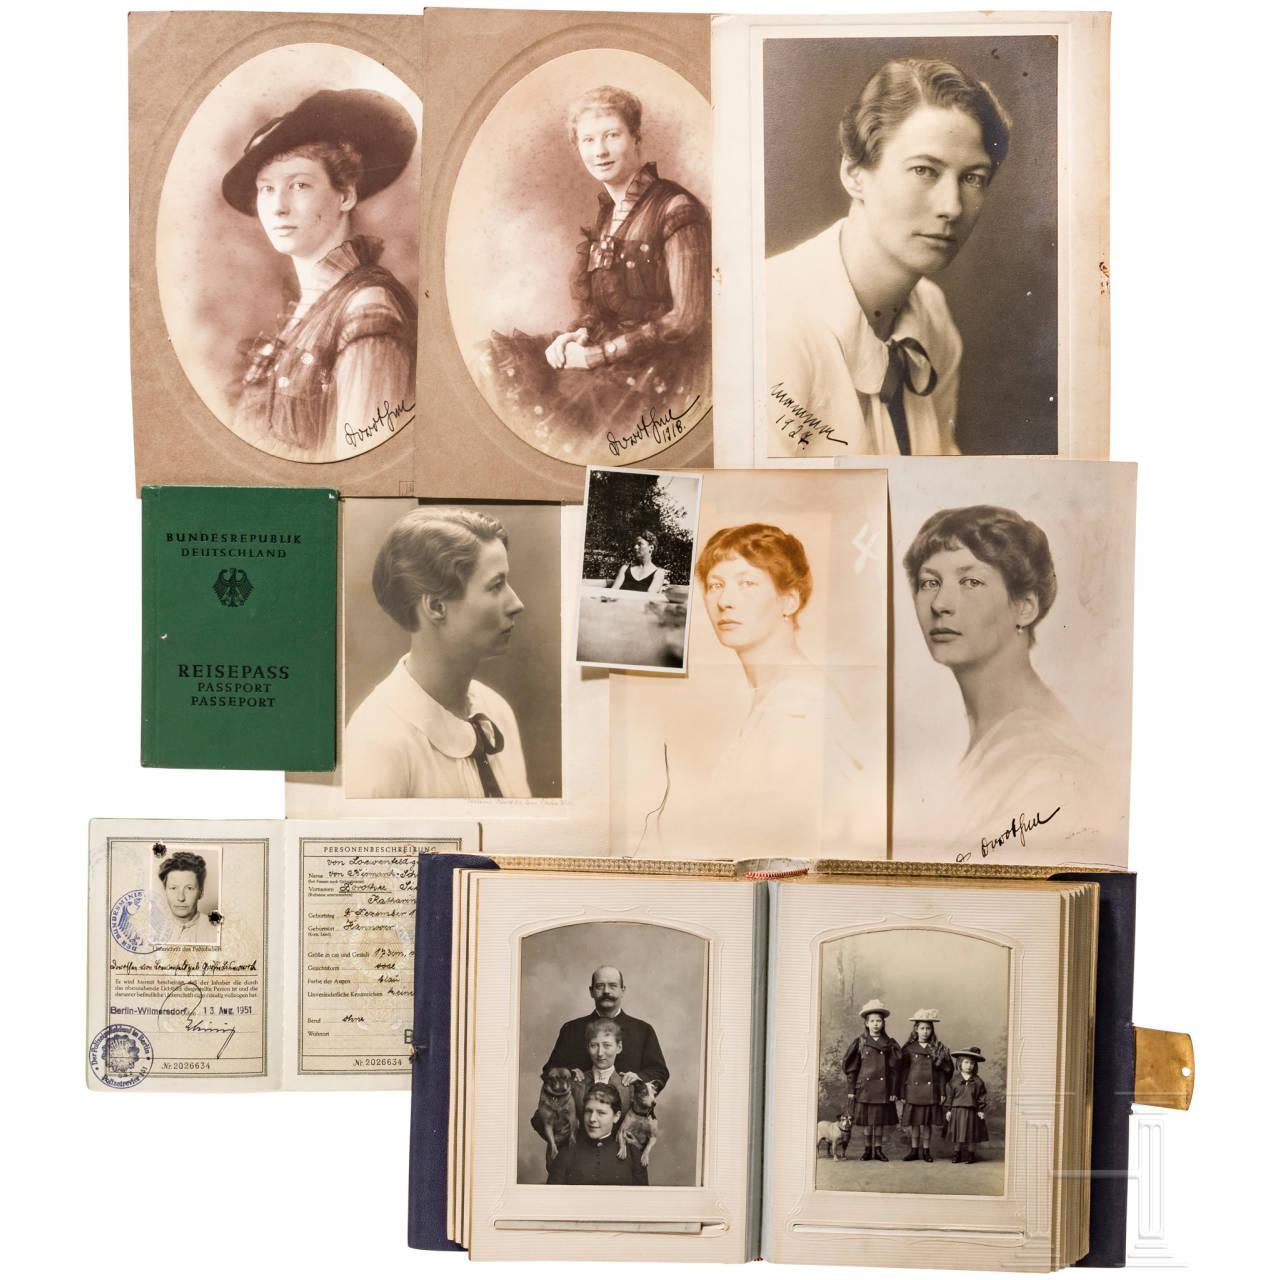 Photos and documents about Dorothee Sibylle Katharina von Bismarck-Schönhausen and her family, 19th / 20th century